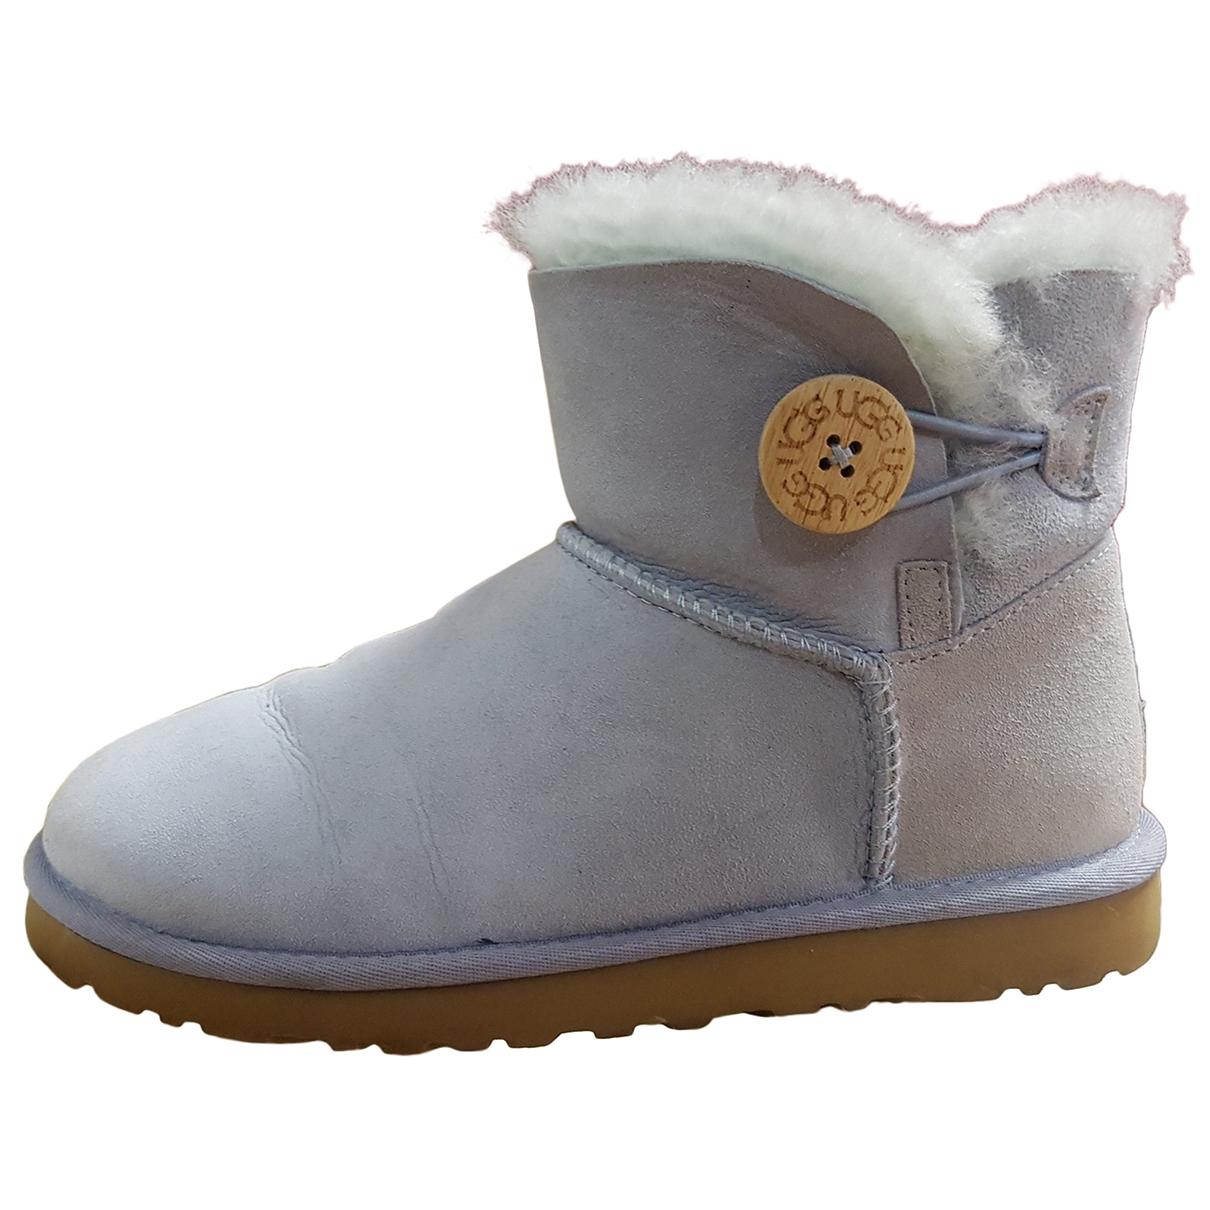 Ugg - Boots   pour femme en suede - turquoise